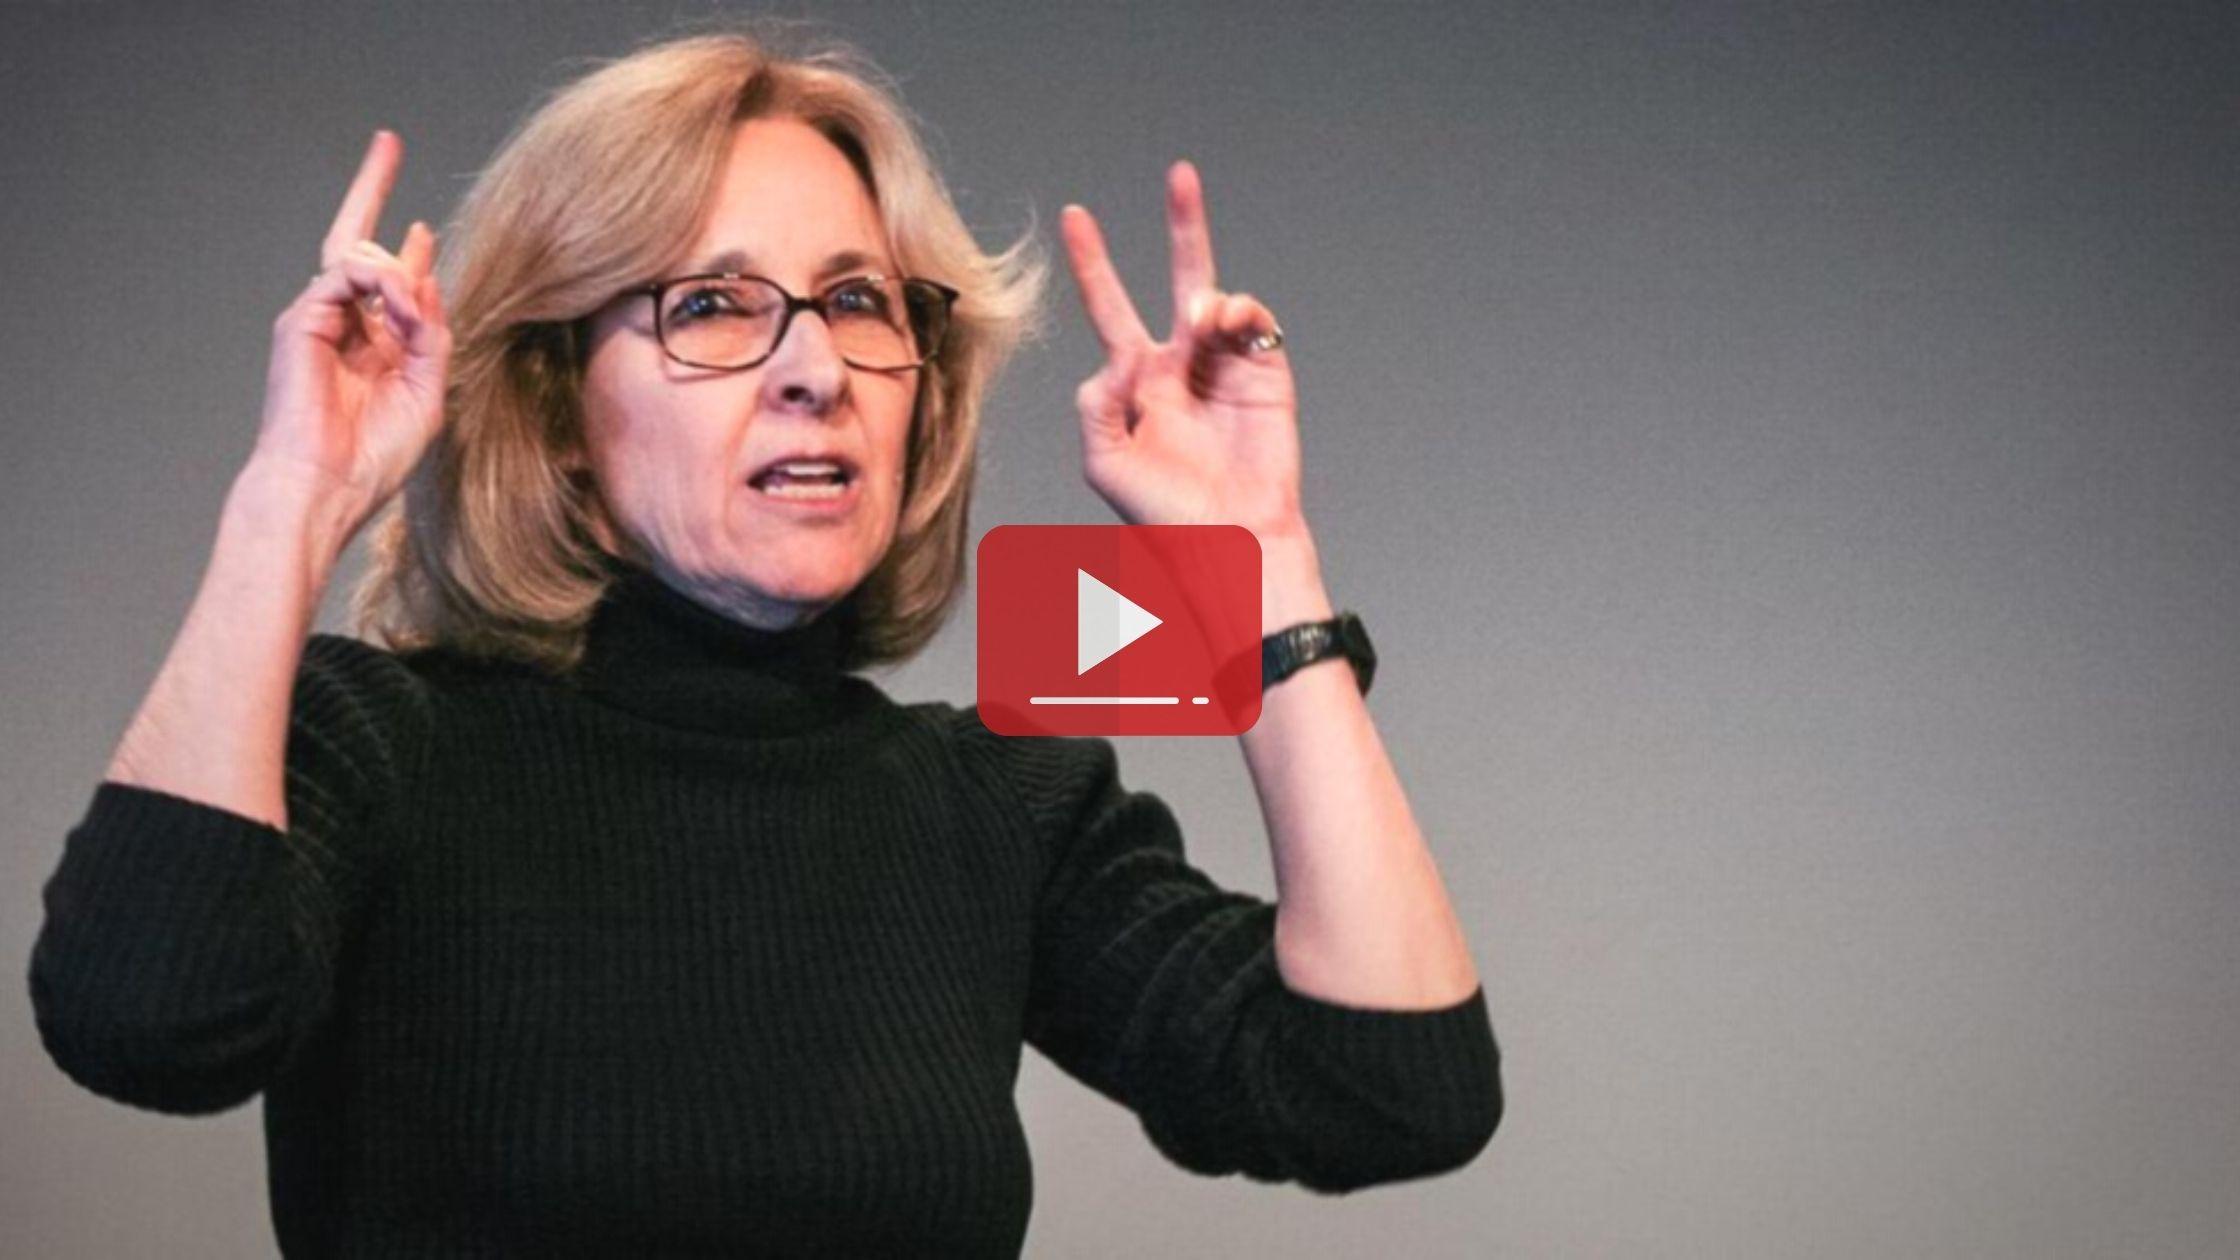 TED Helen Fischer